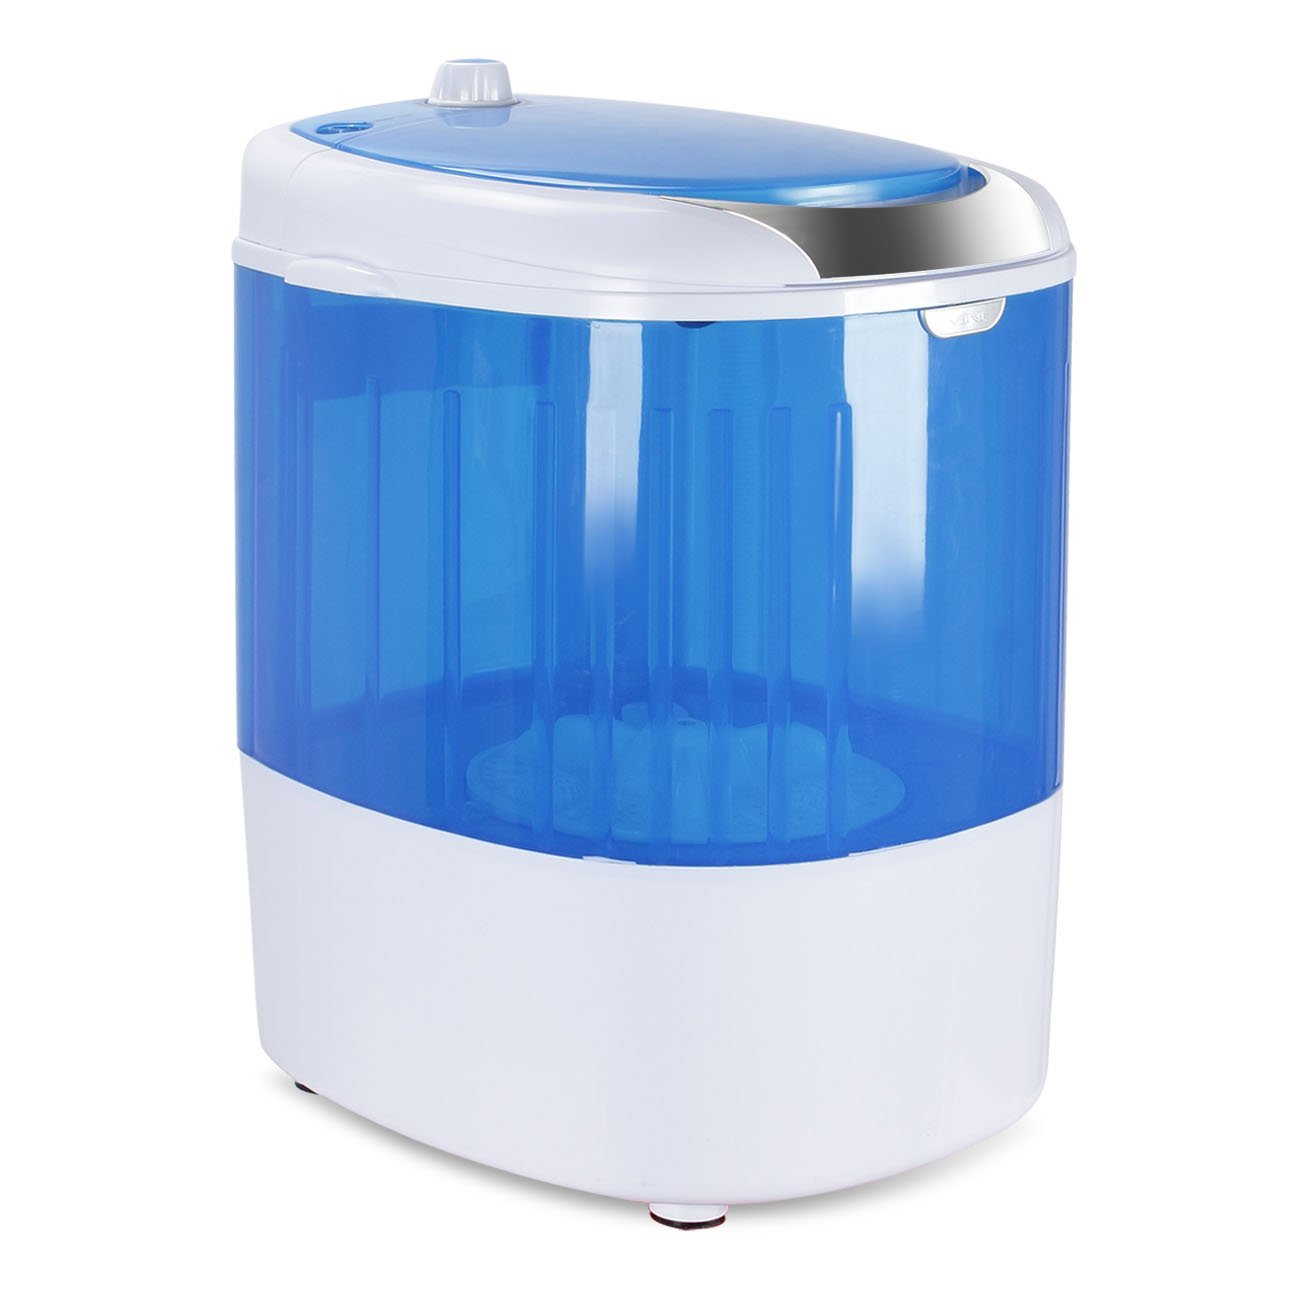 DELLA Portable Washing Machine Top Loader Small Compact Mini Washer 6.6 LBS Load Capacity, Blue